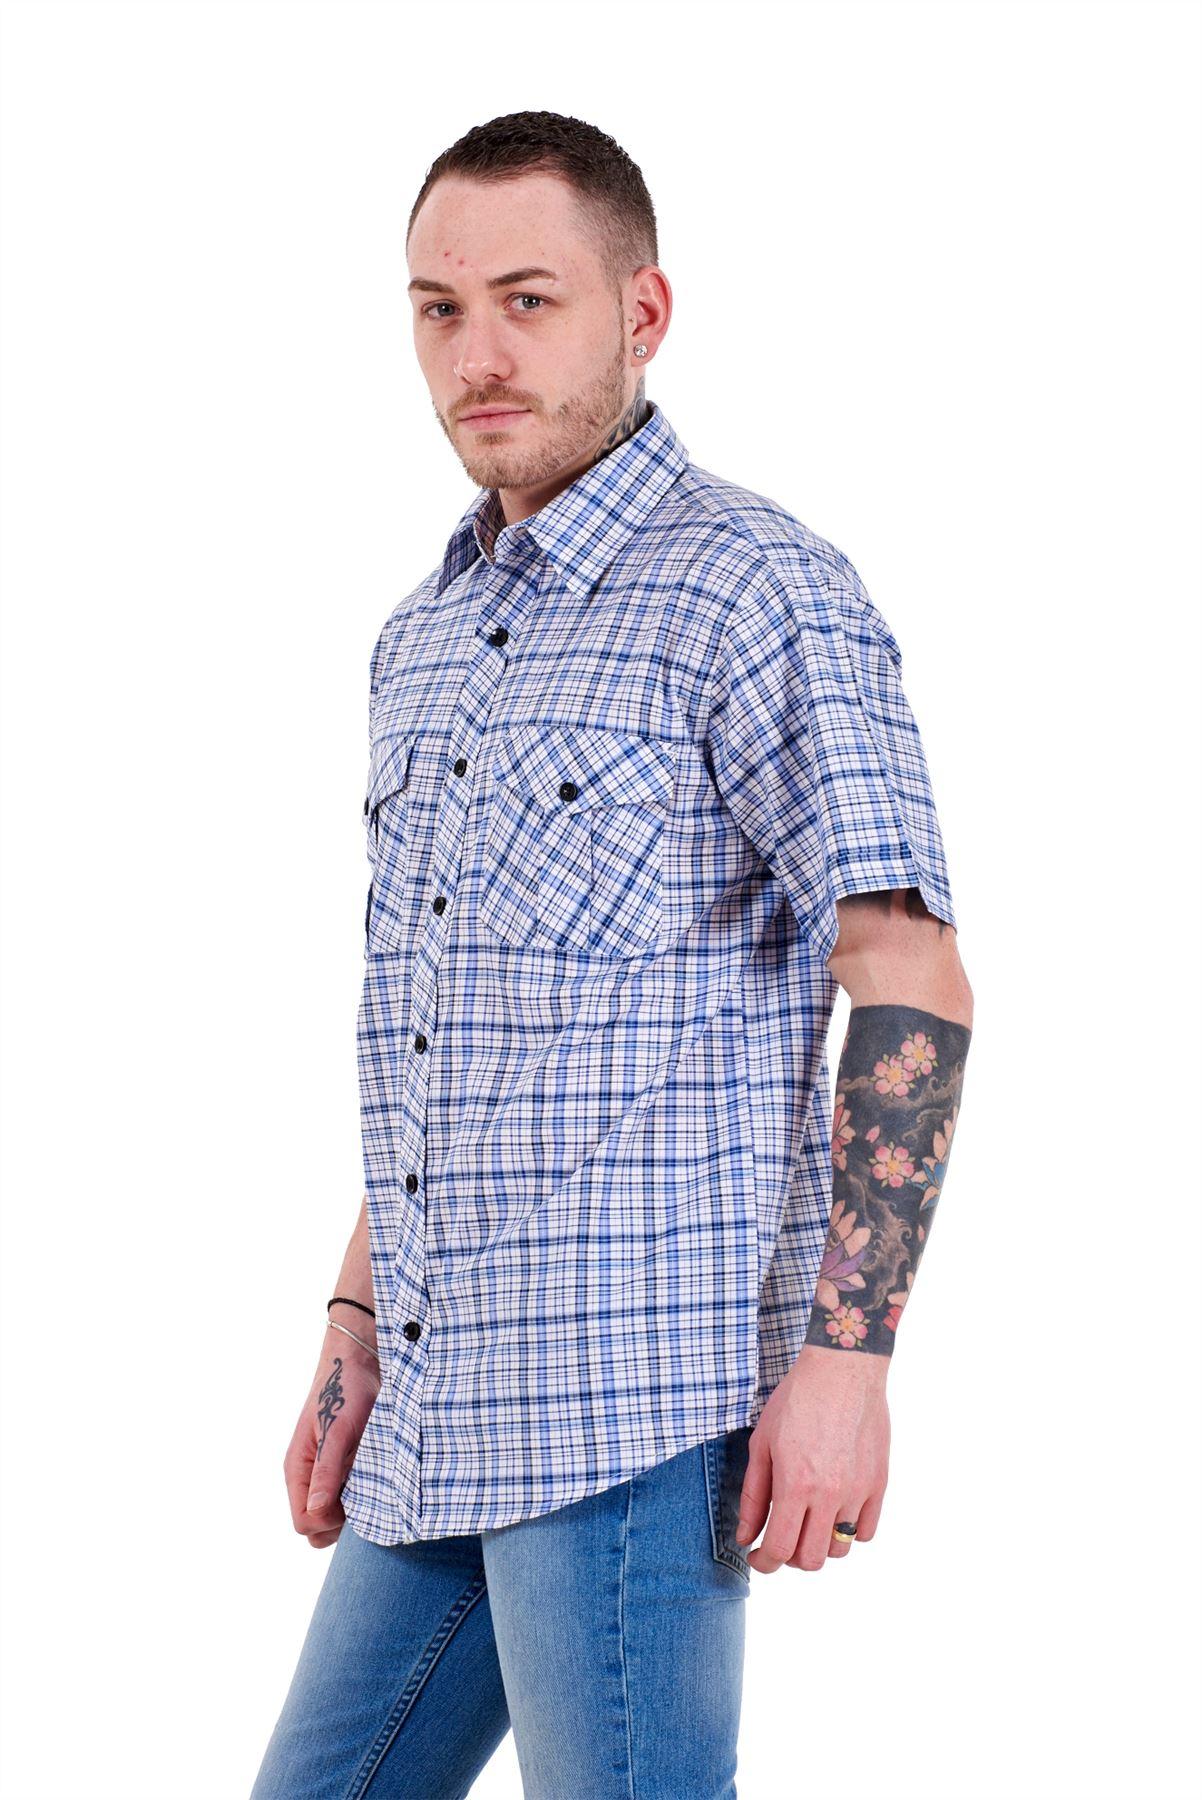 Mens-Regular-Big-Size-Shirts-Checked-Cotton-Blend-Casual-Short-Sleeve-M-to-5XL thumbnail 3